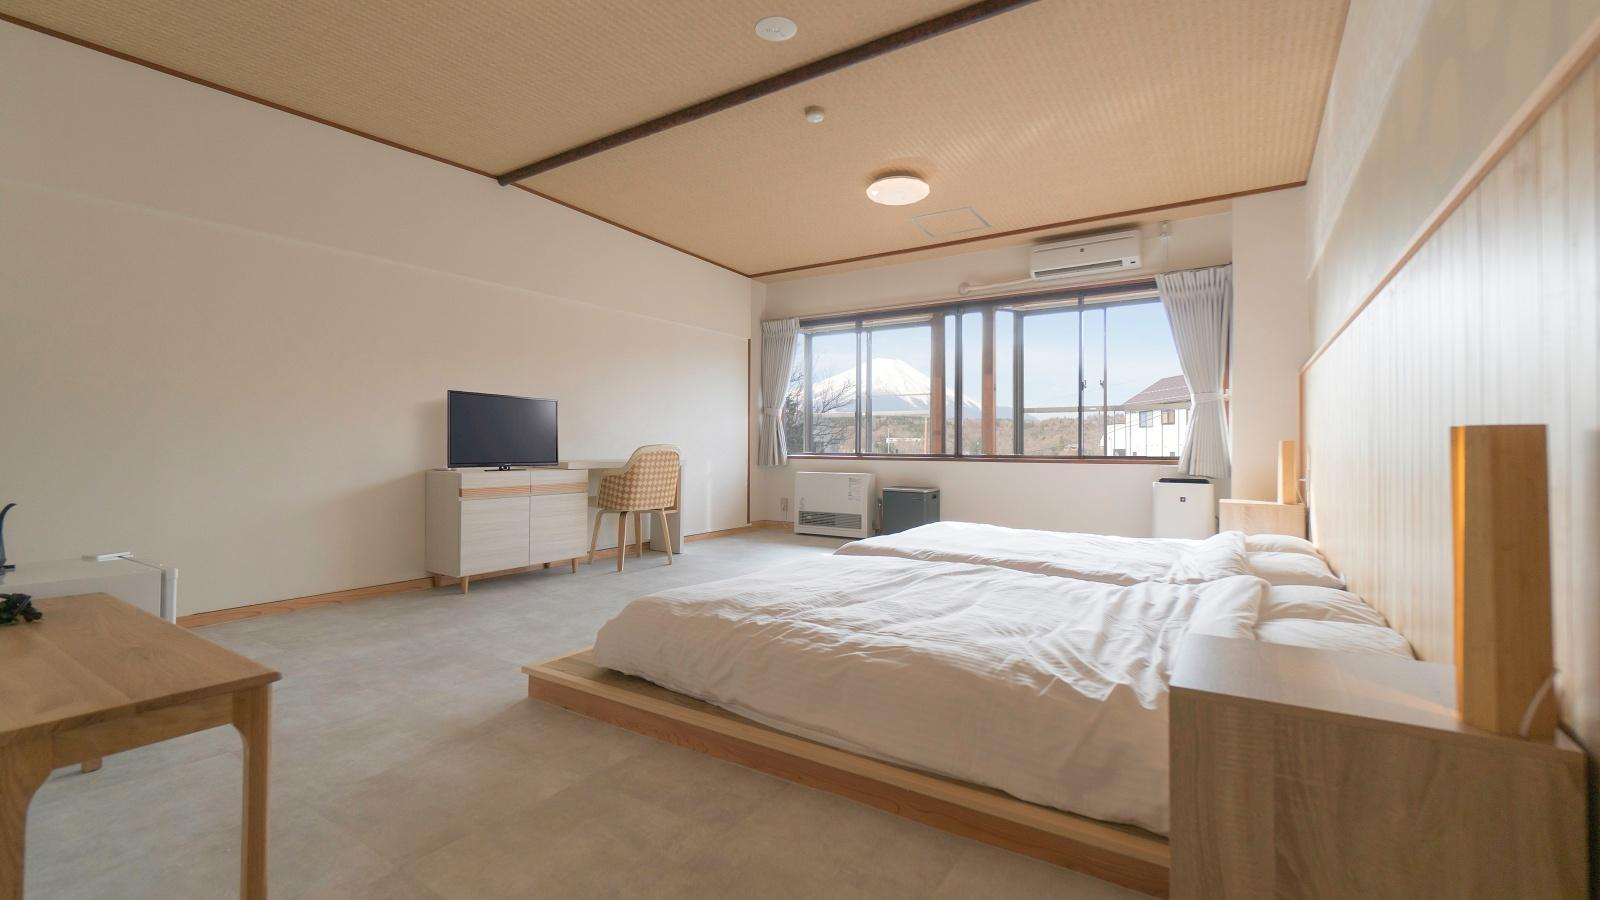 VOYAN Resort富士山中湖・月湖荘-1